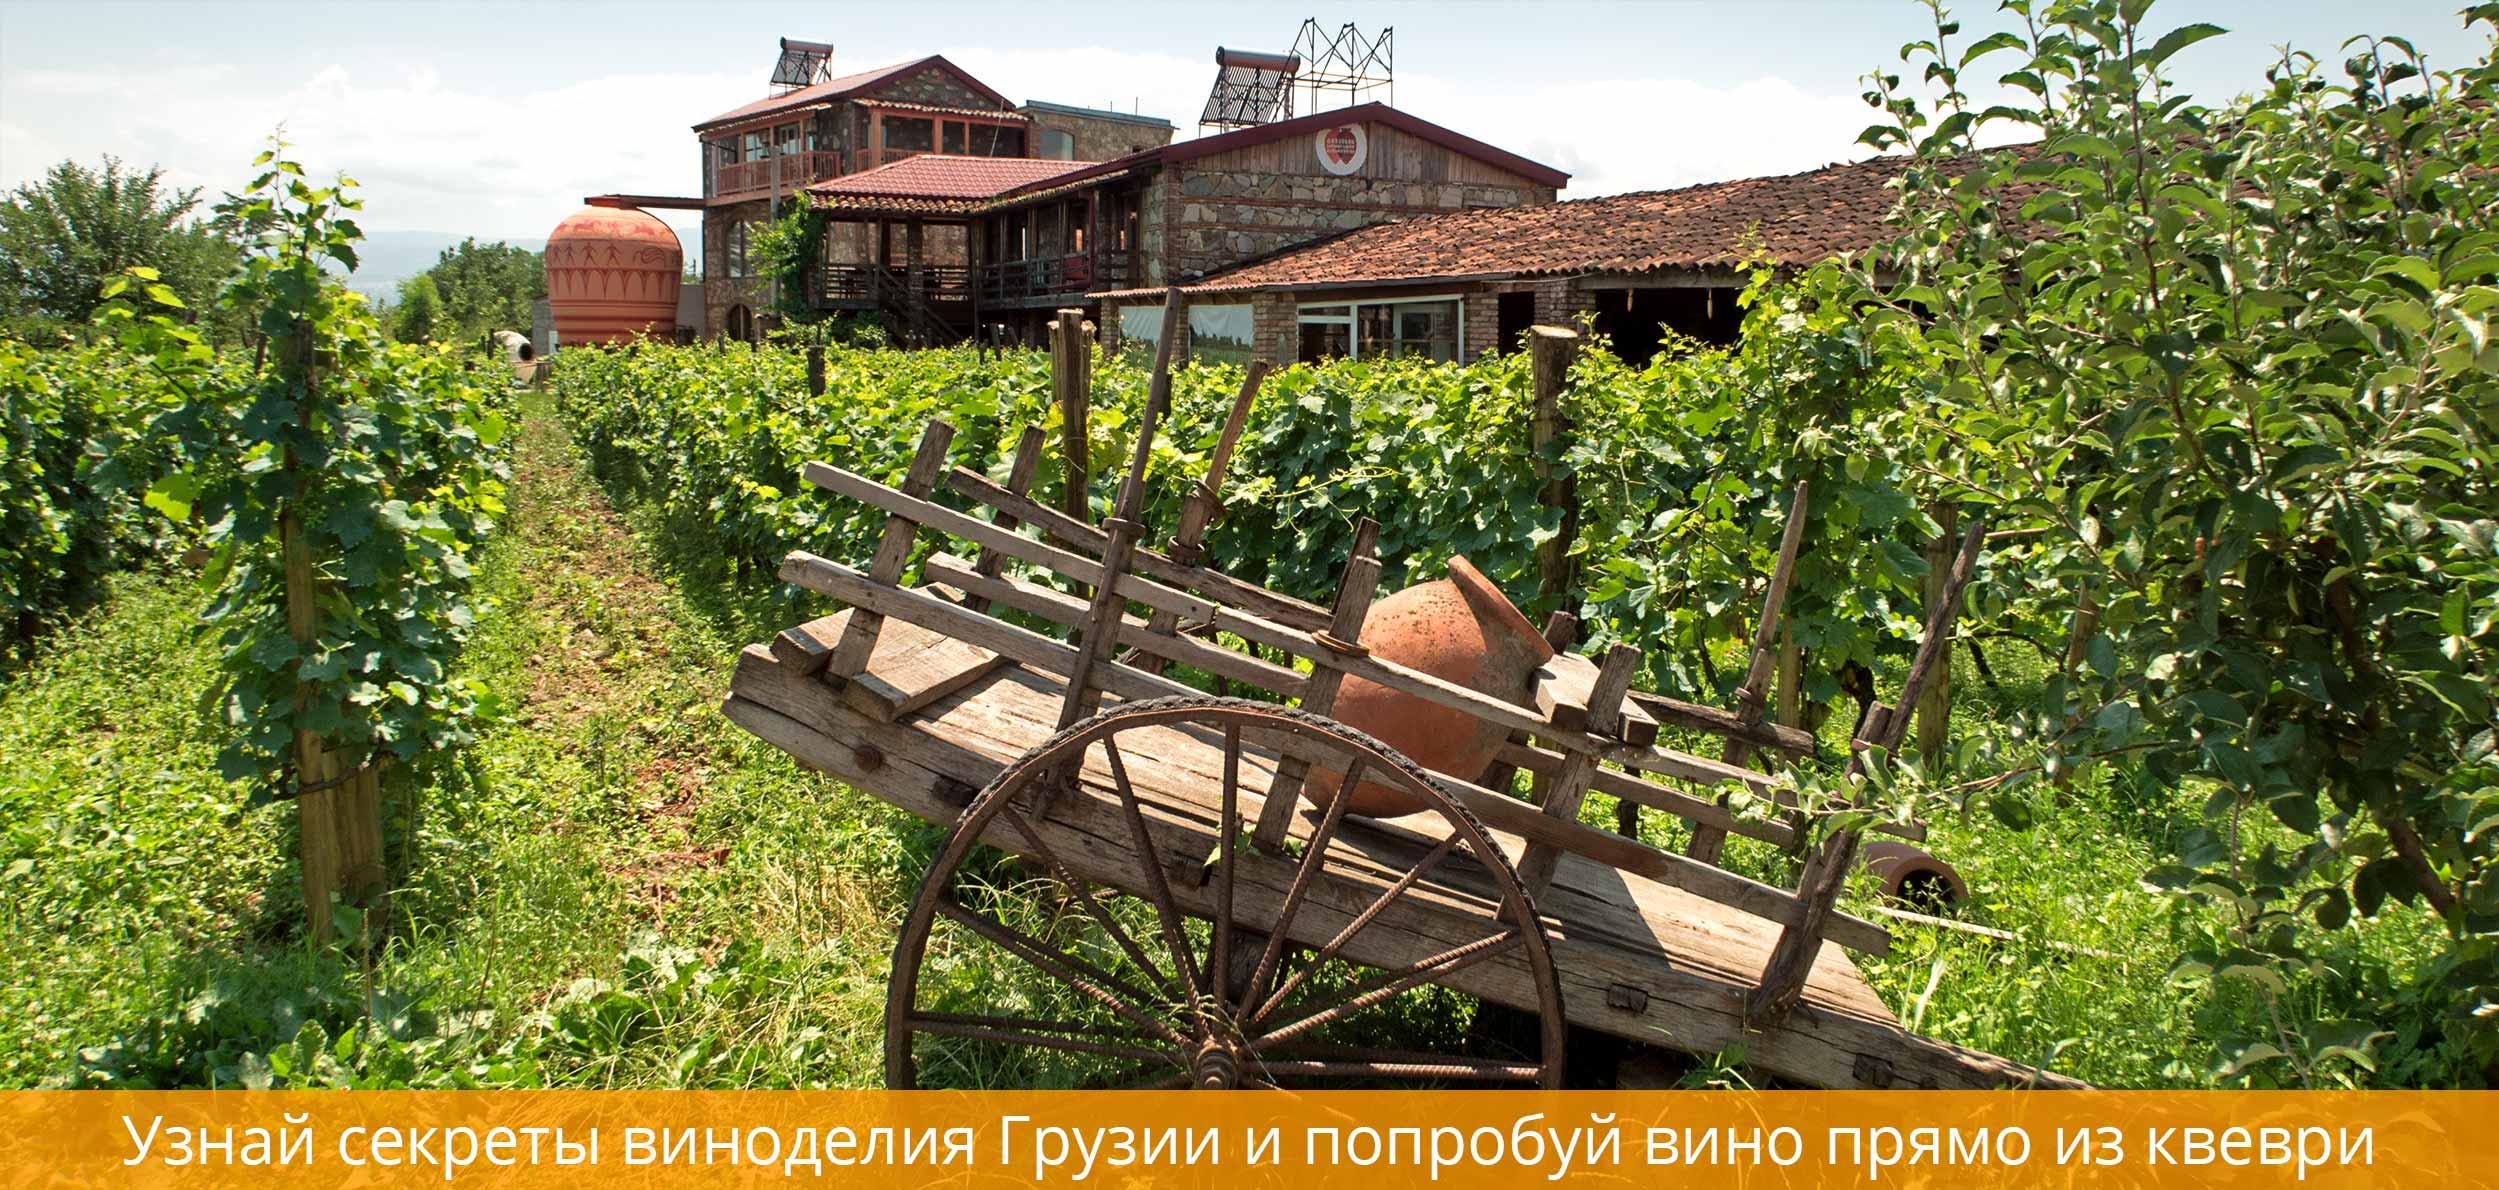 Музей Вина Братьев Близнецов Напареули